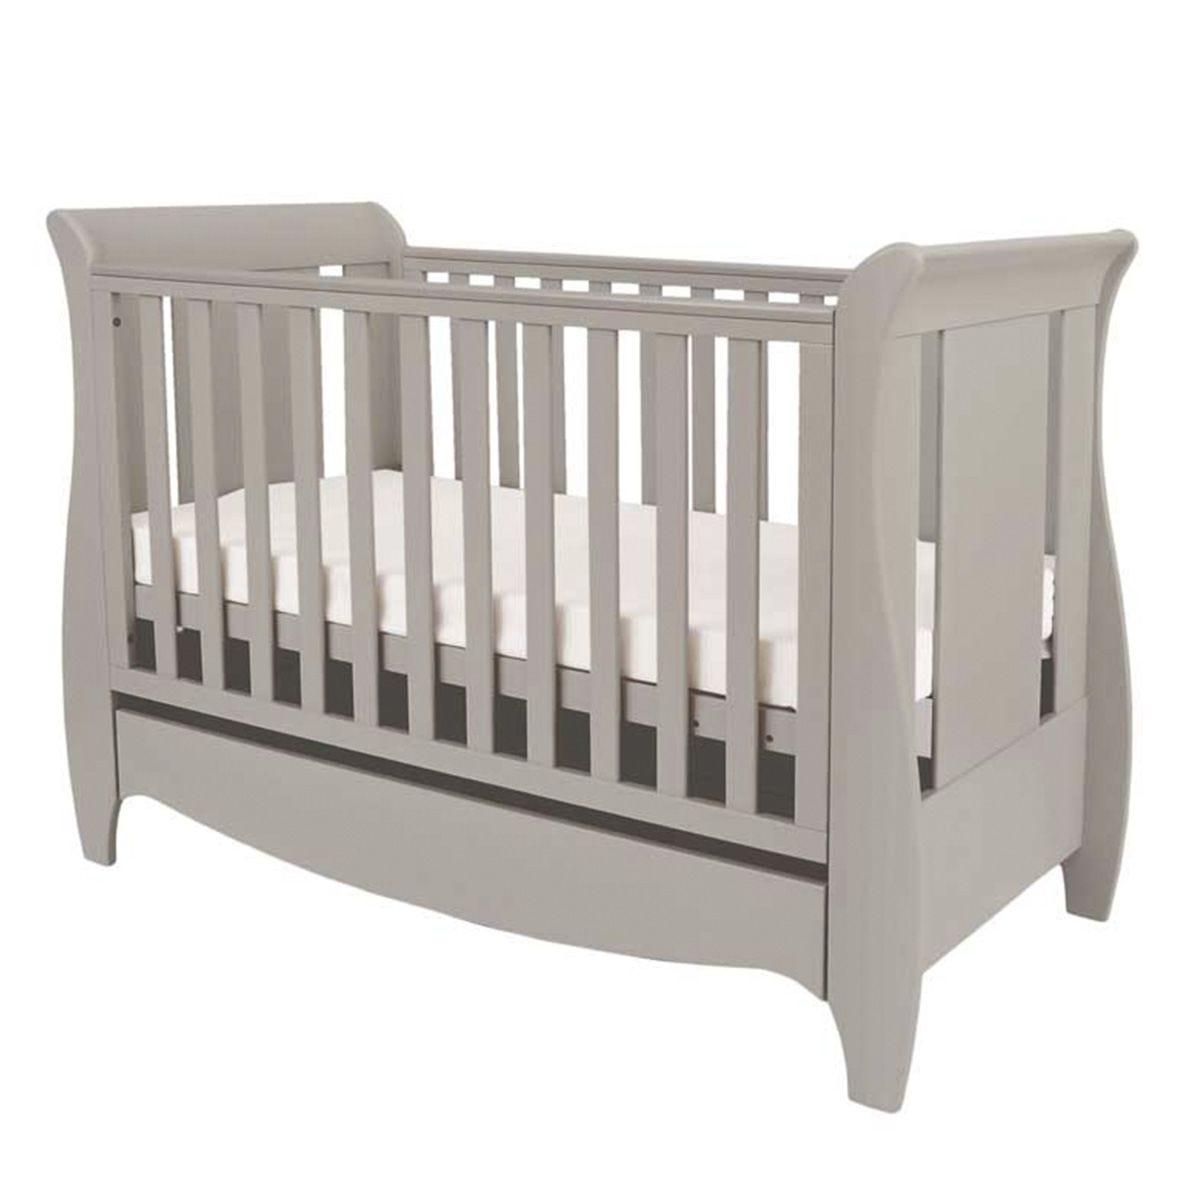 Tutti Bambini Roma Mini Sleigh Cot Bed with Drawer – Truffle Grey